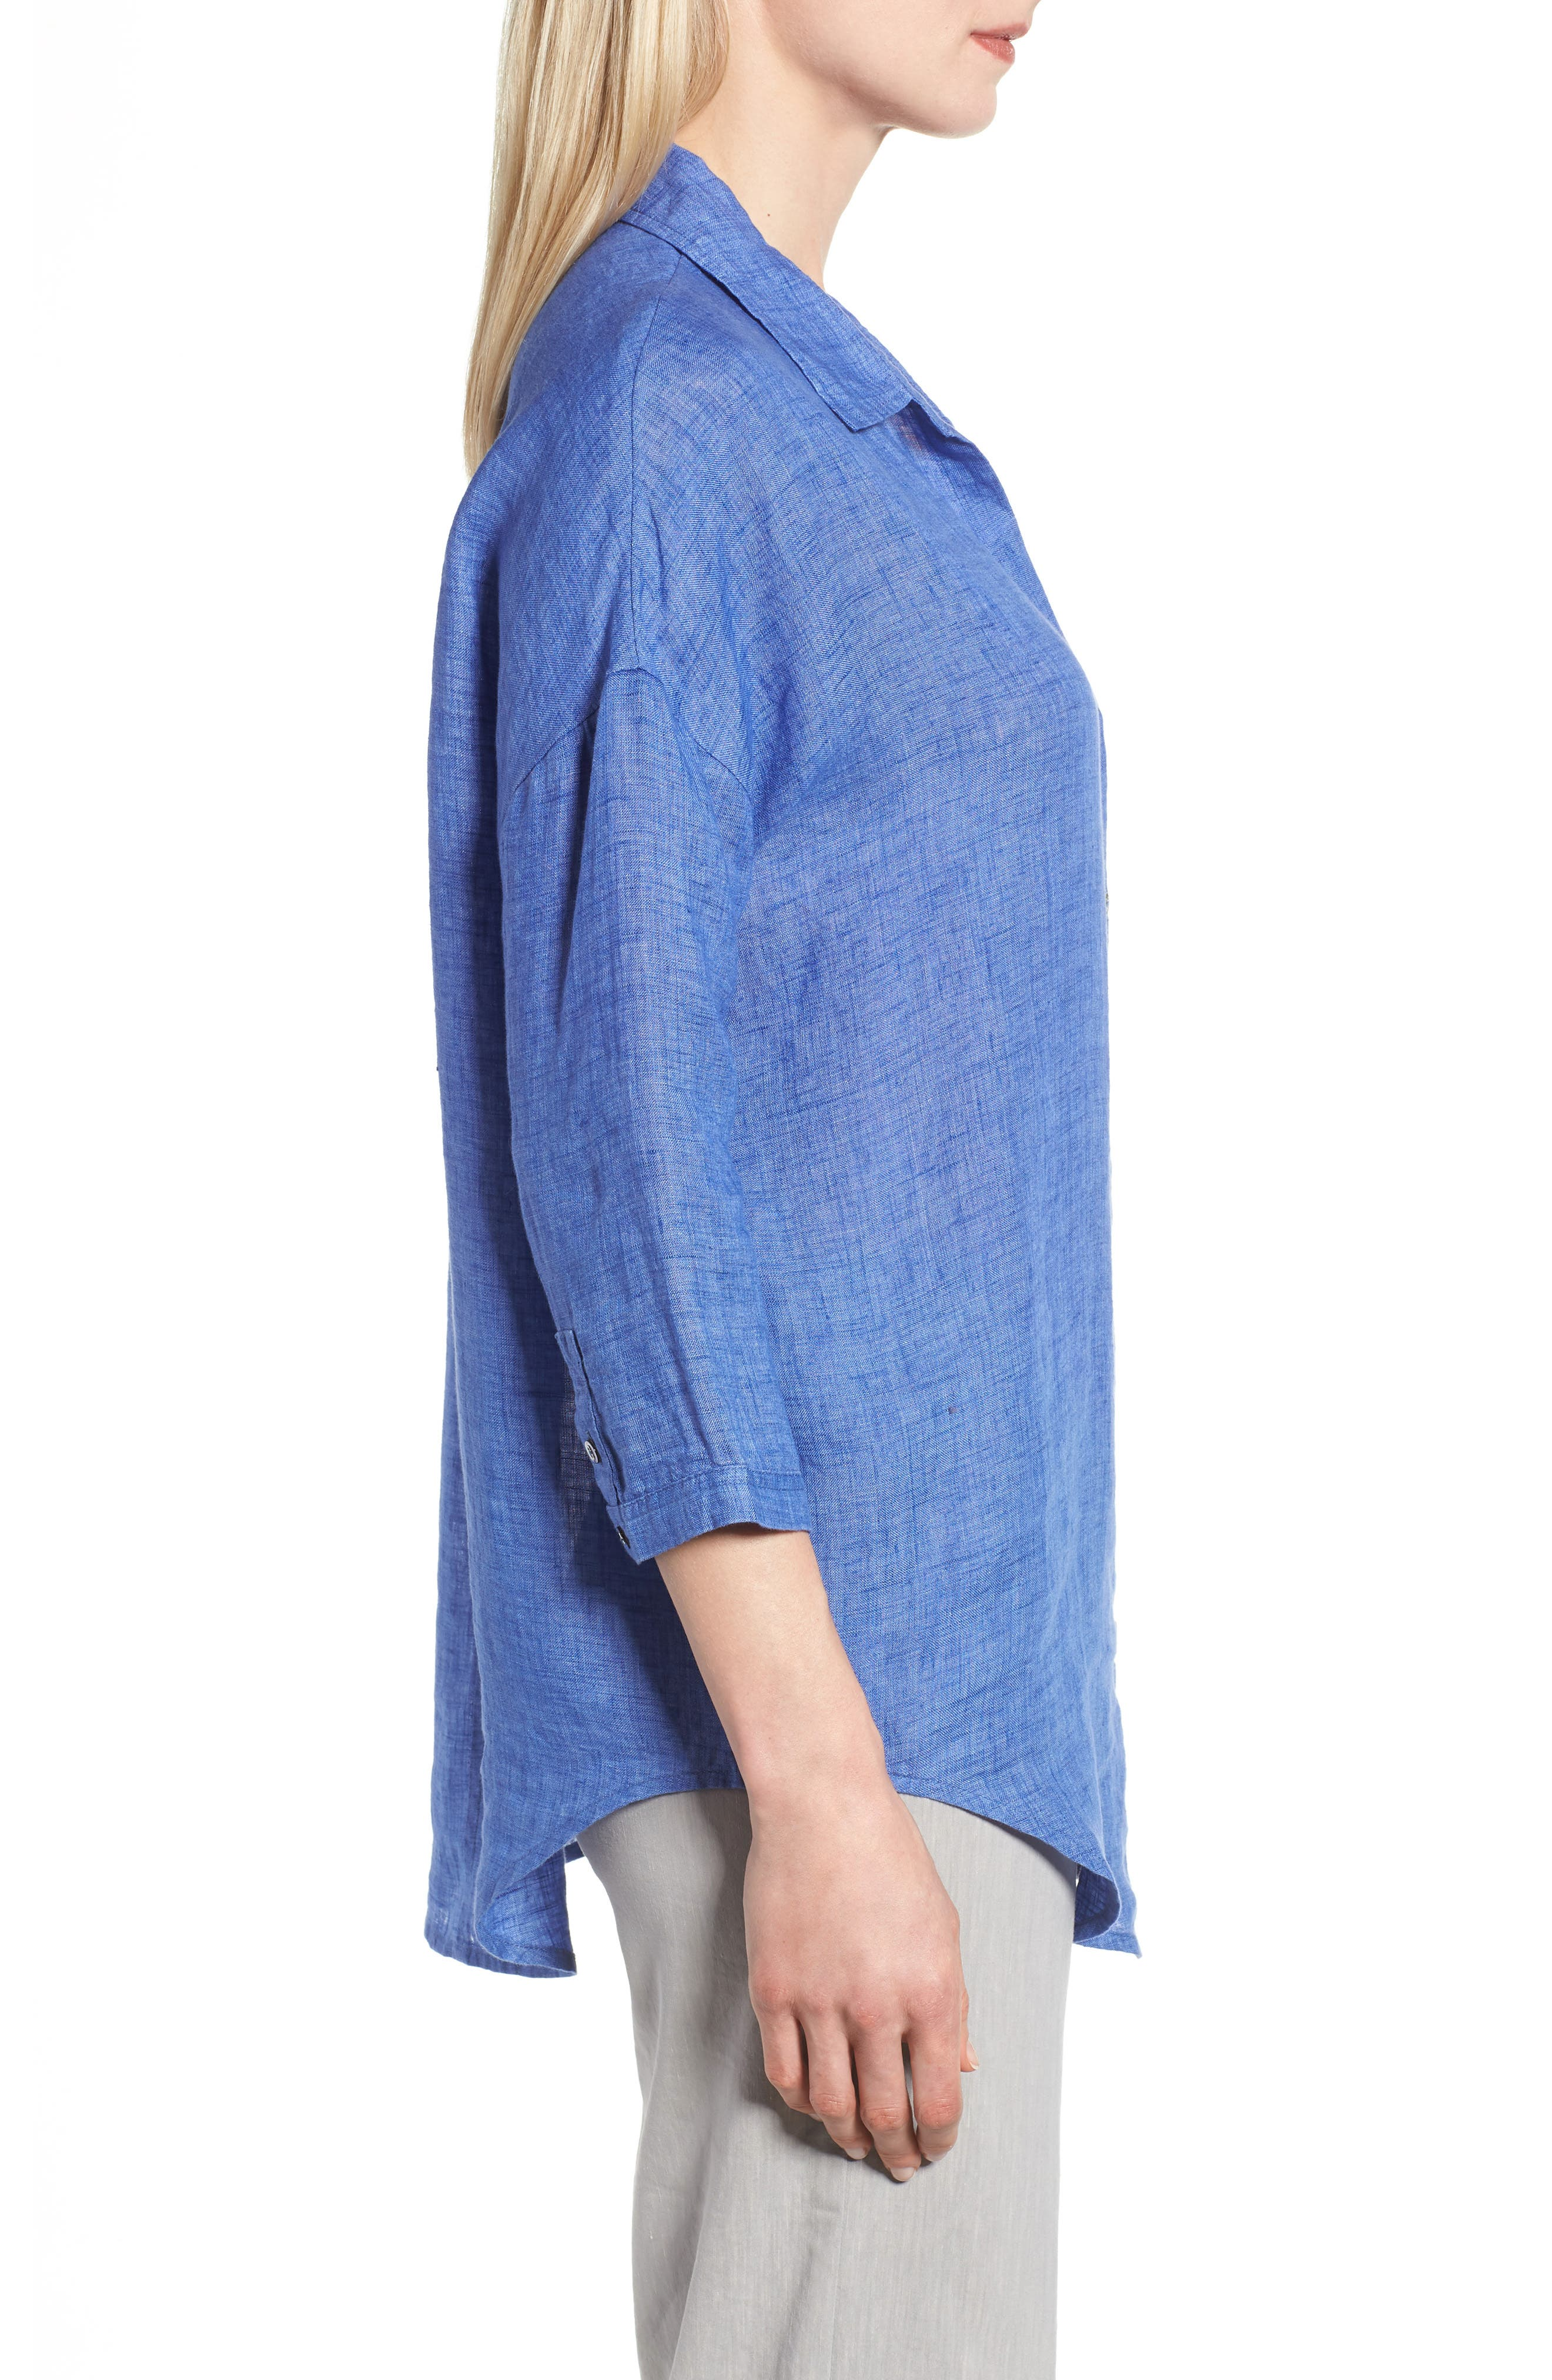 Joy Ride Linen Tunic Top,                             Alternate thumbnail 3, color,                             487